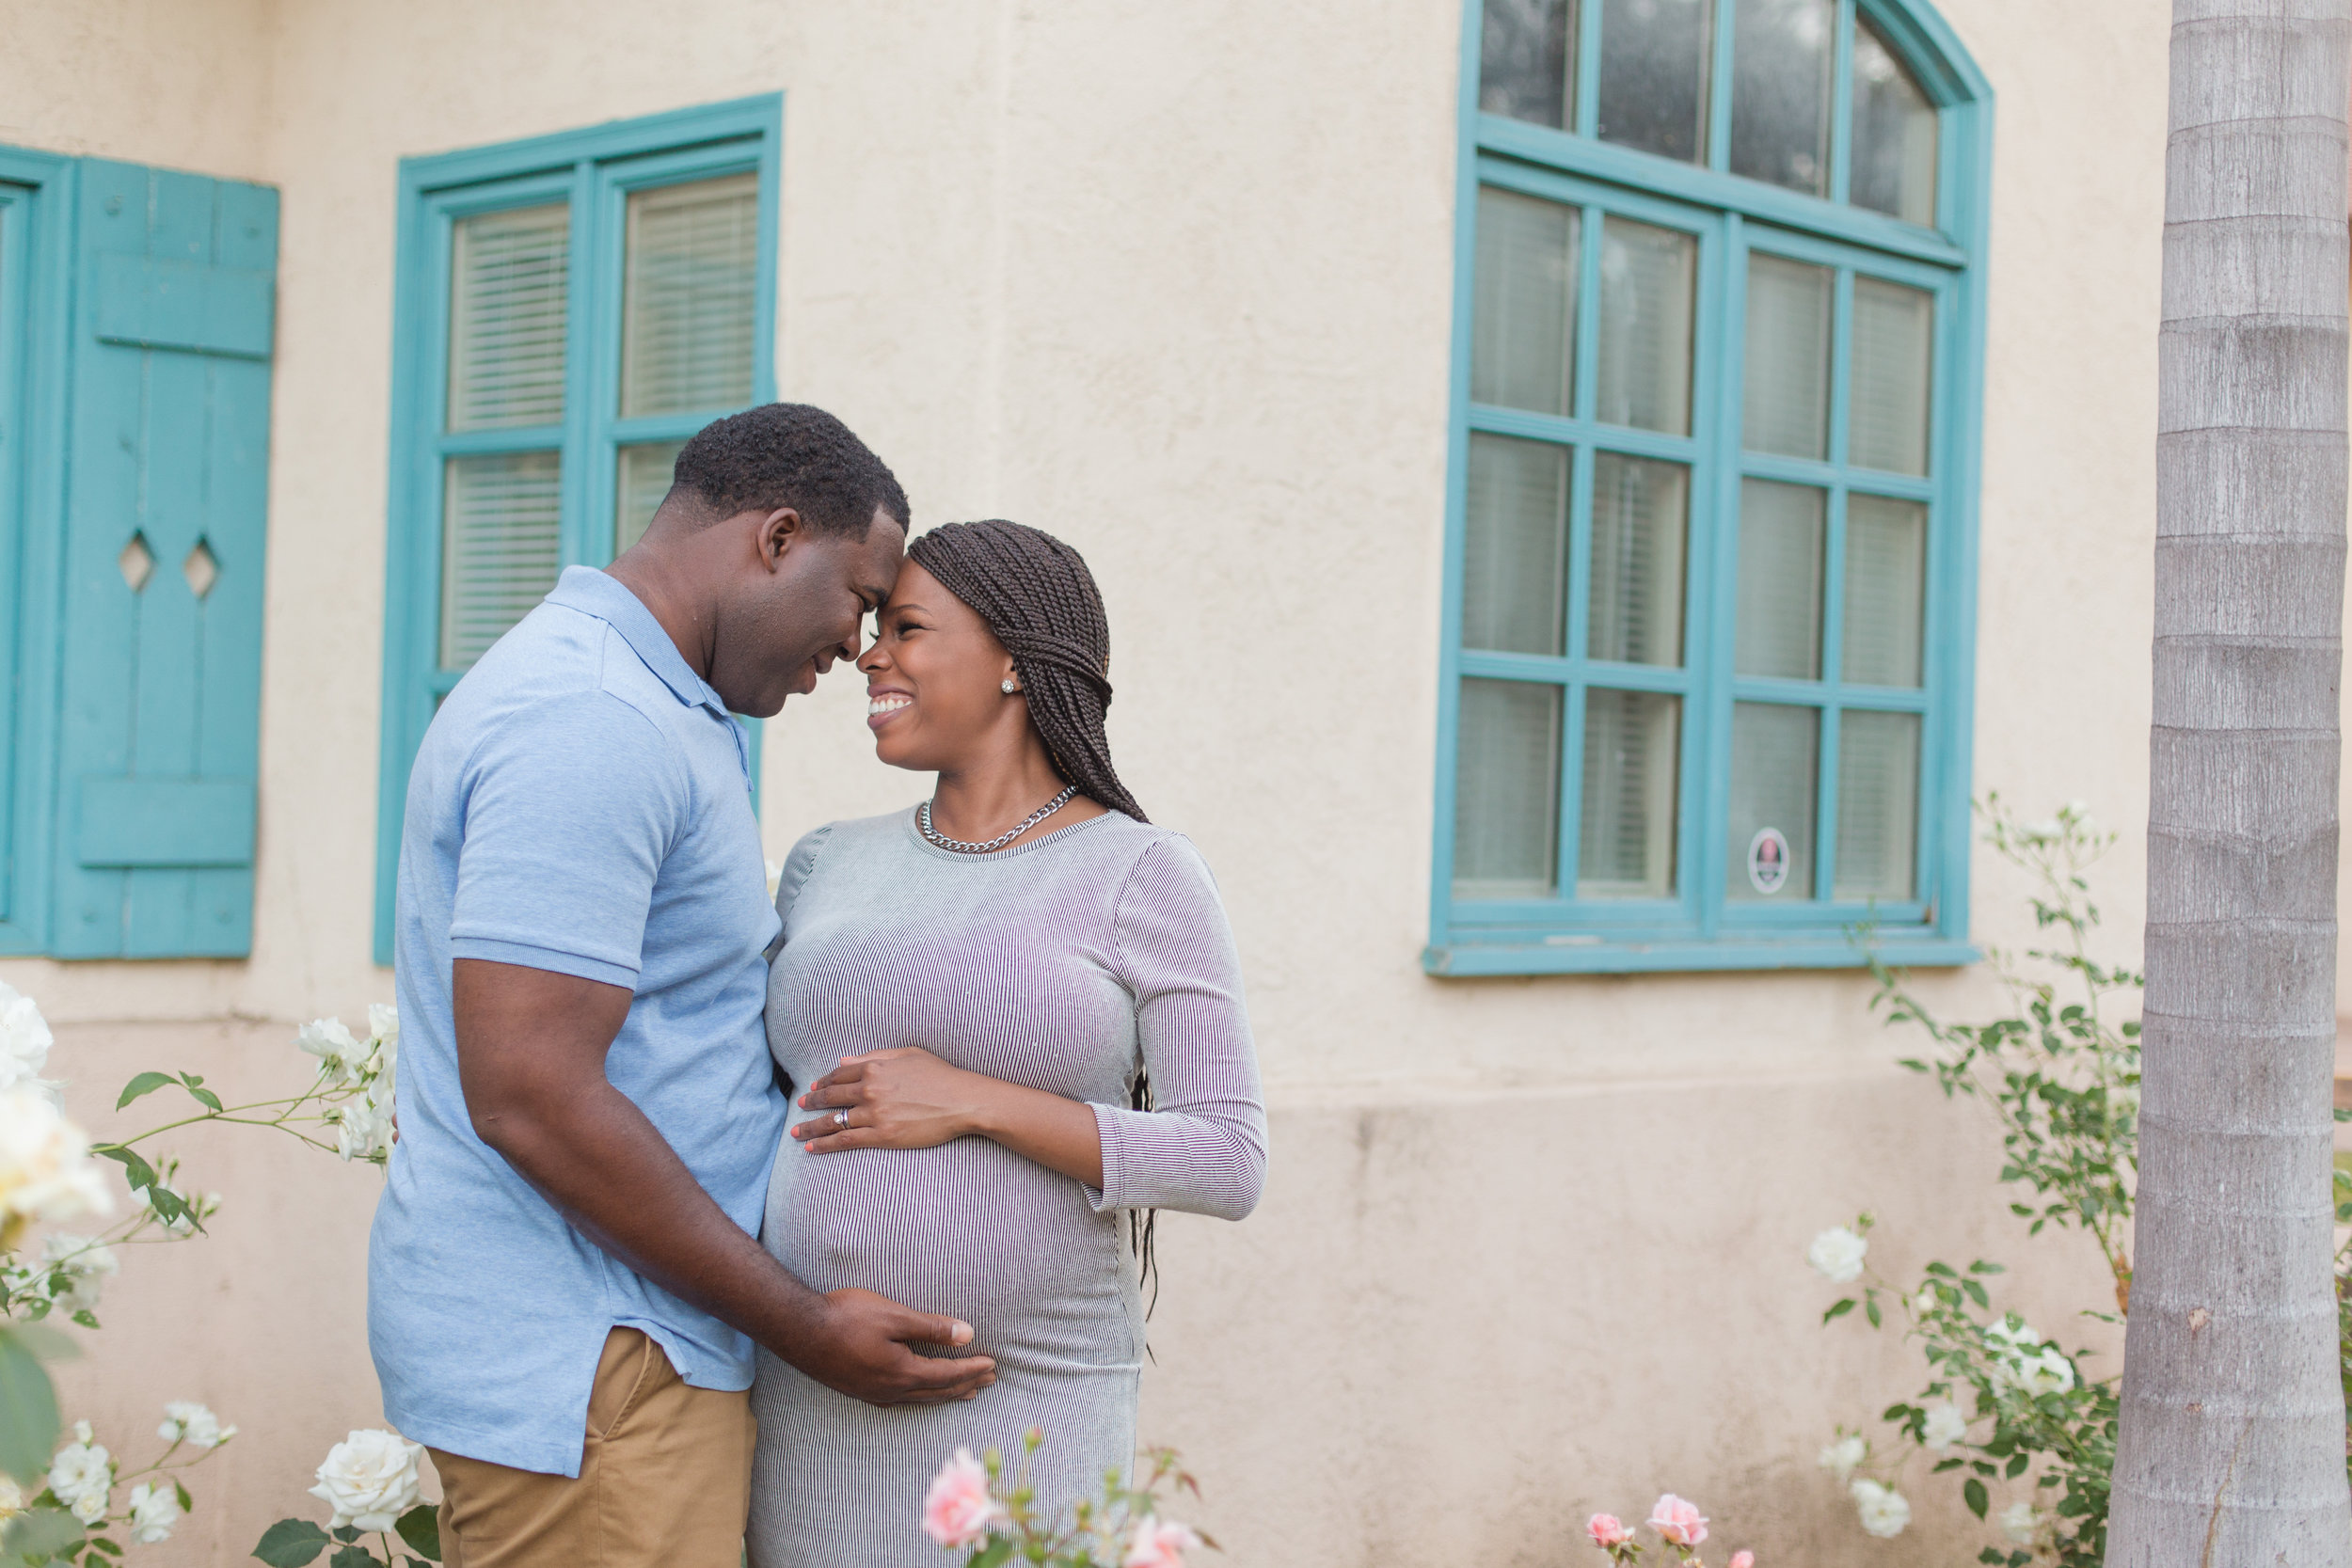 Balboa Park Maternity Session | Summer 2016